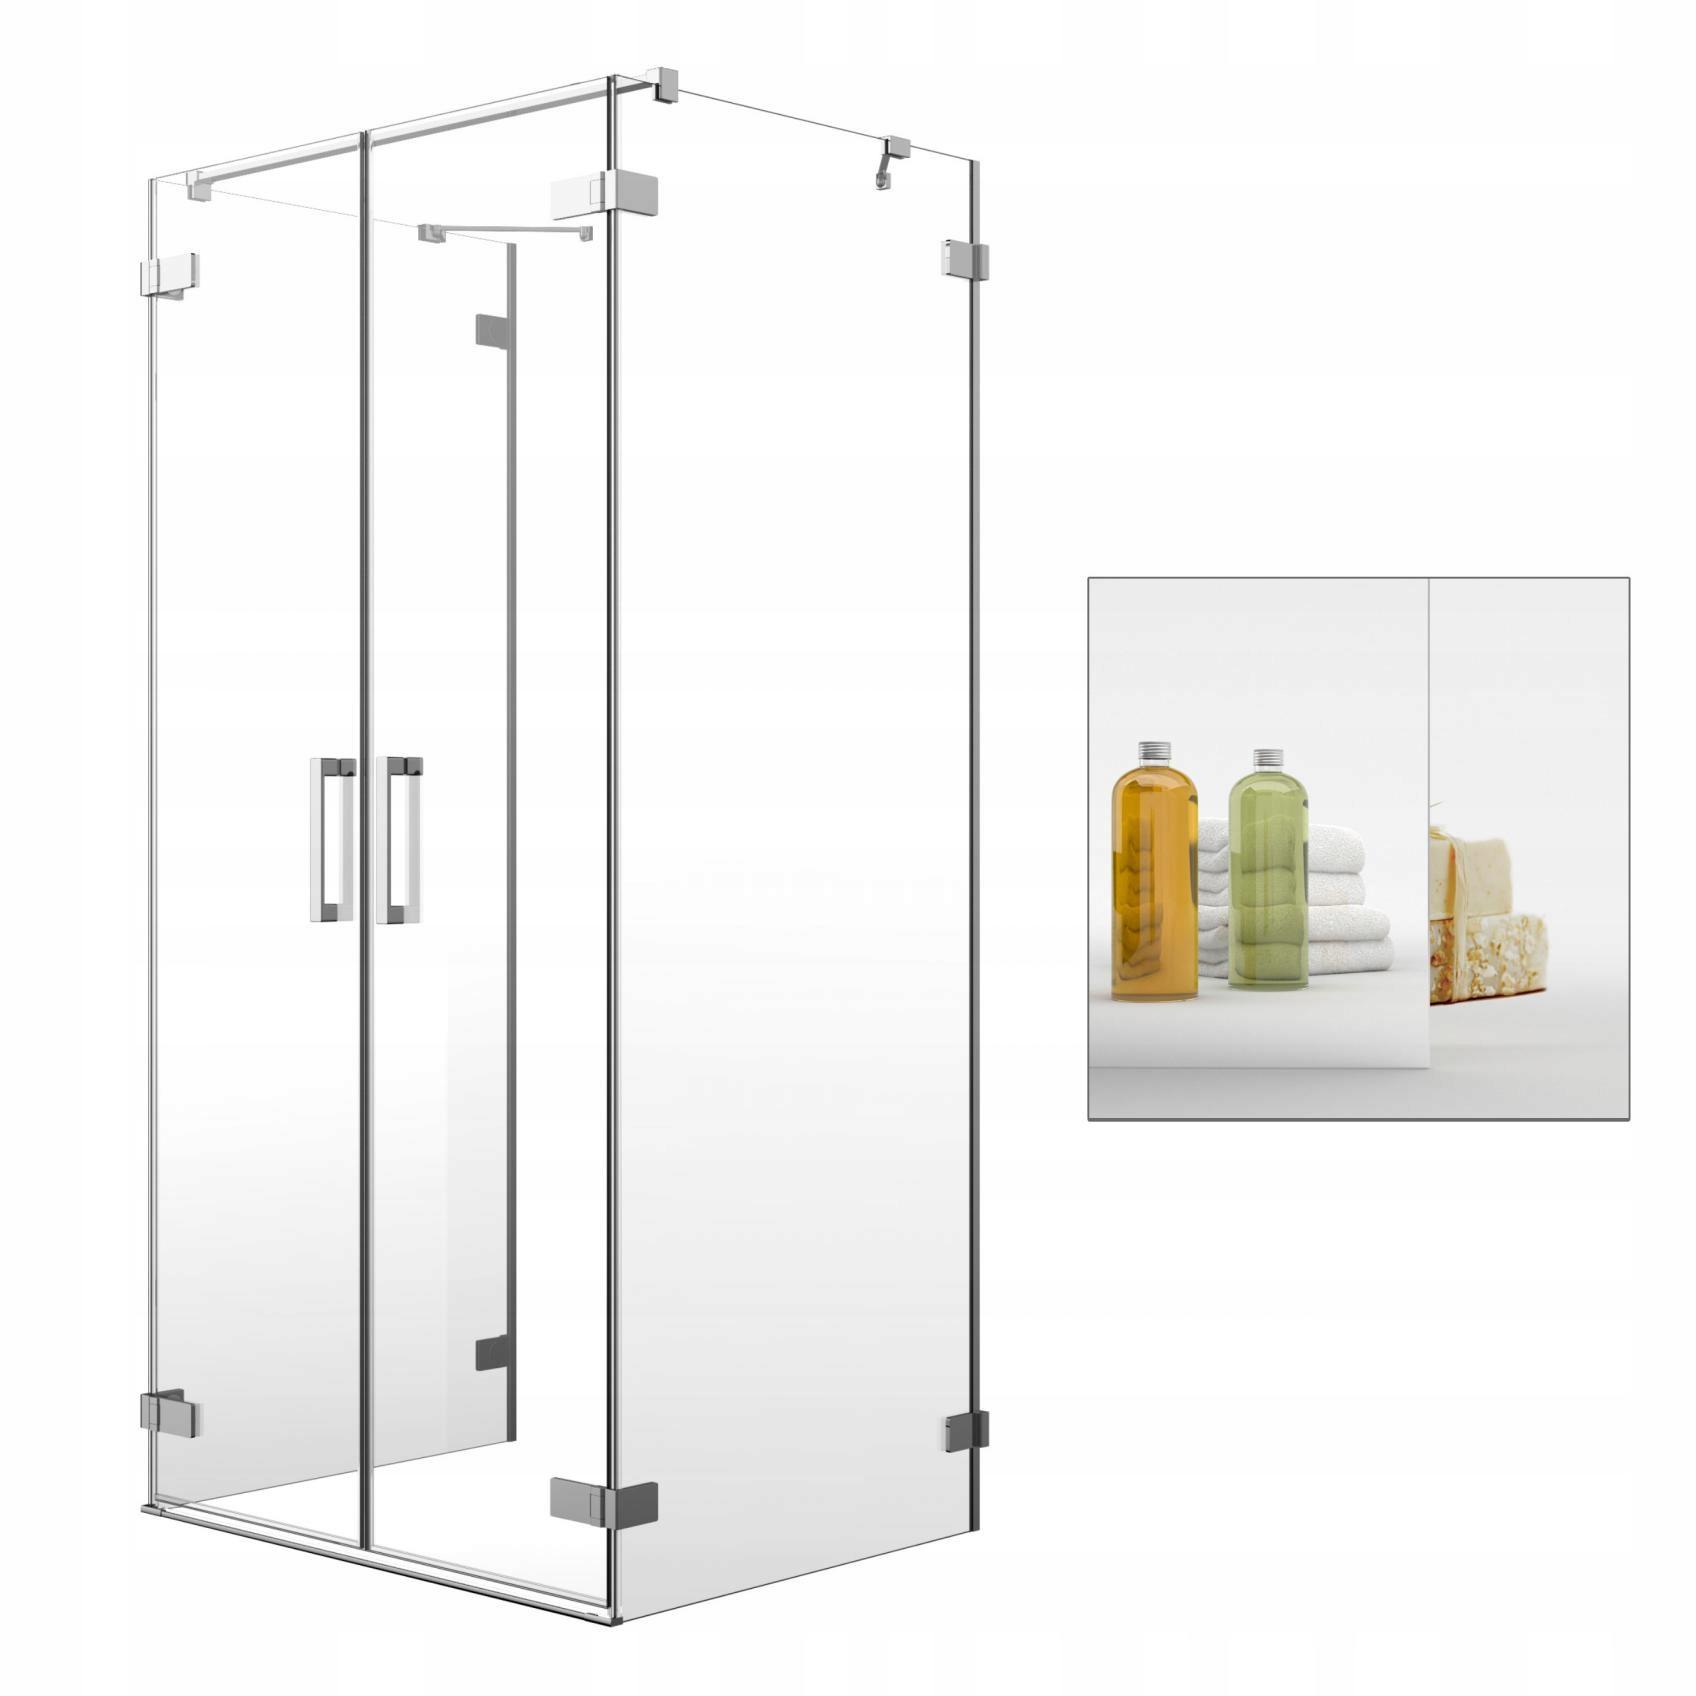 Sprchové kabíny Umenie DWD+2S 100x100 sklo zrkadla